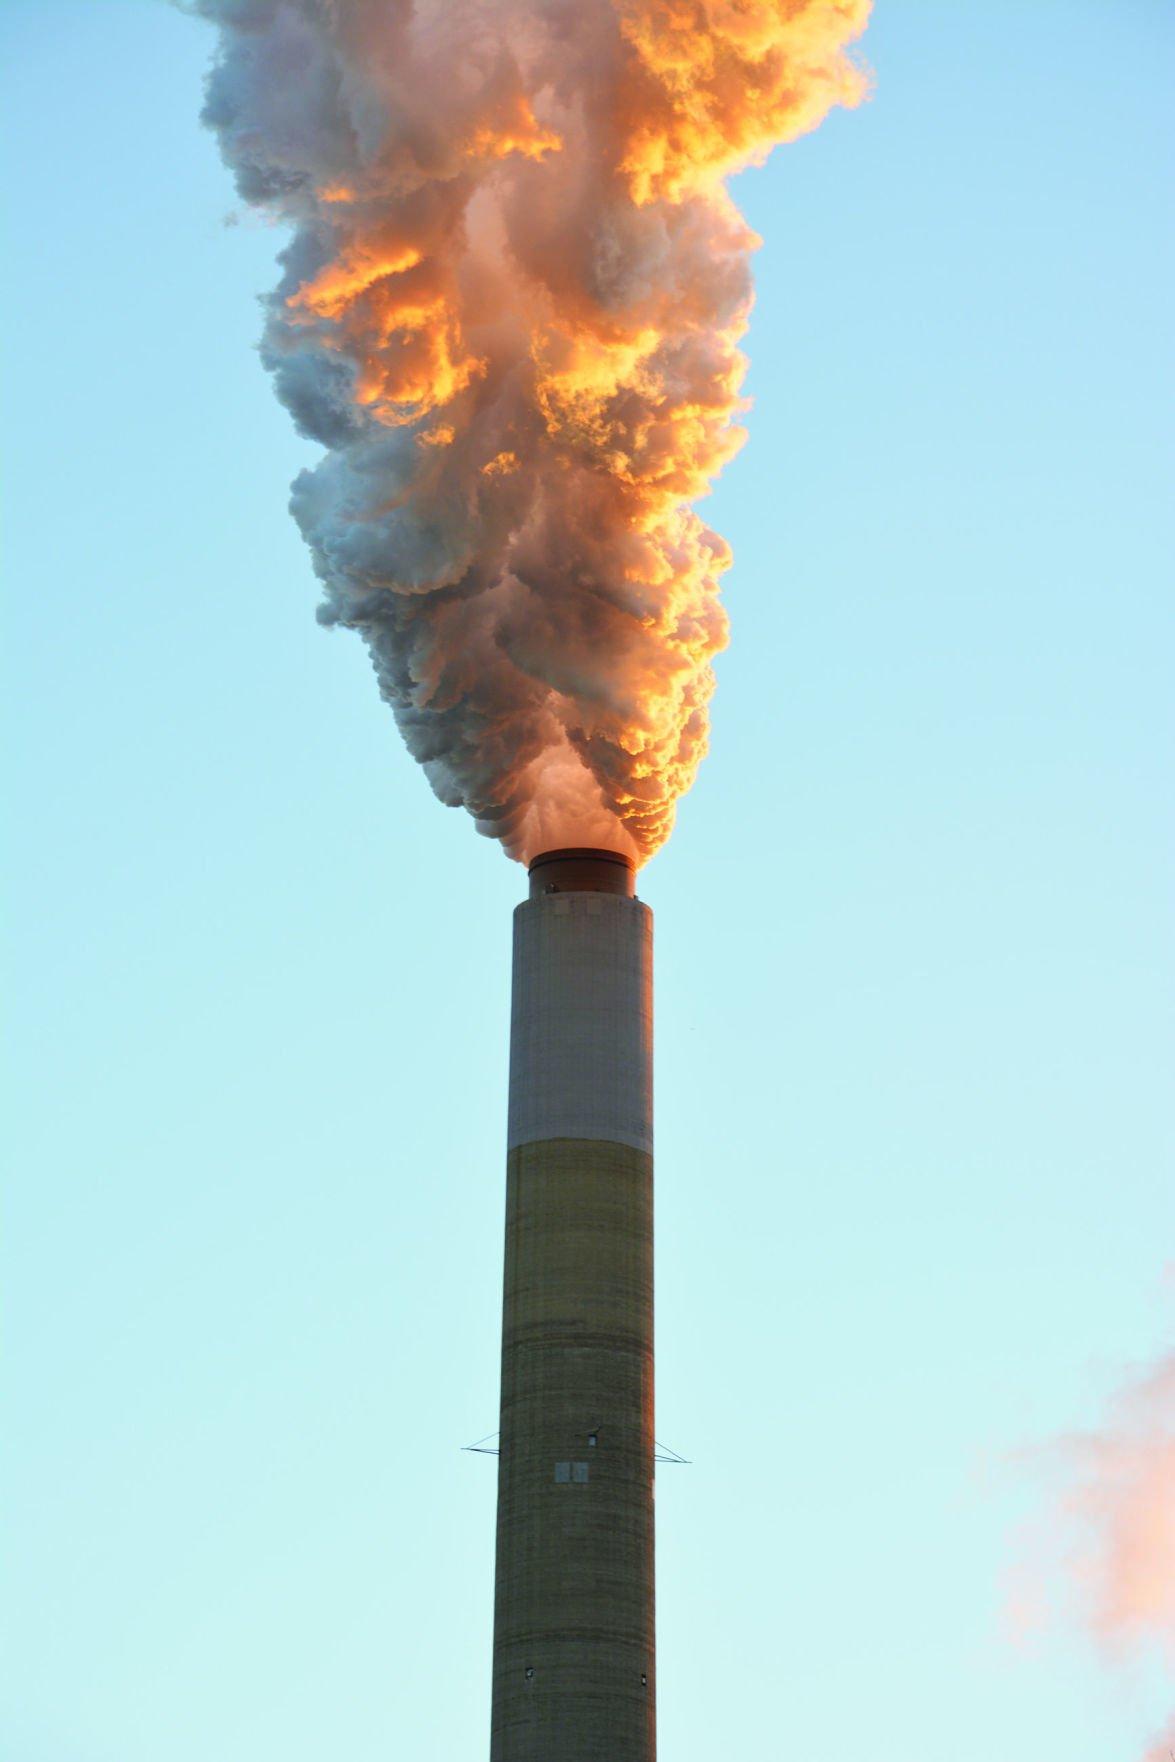 Power plant smoke stack and NETL